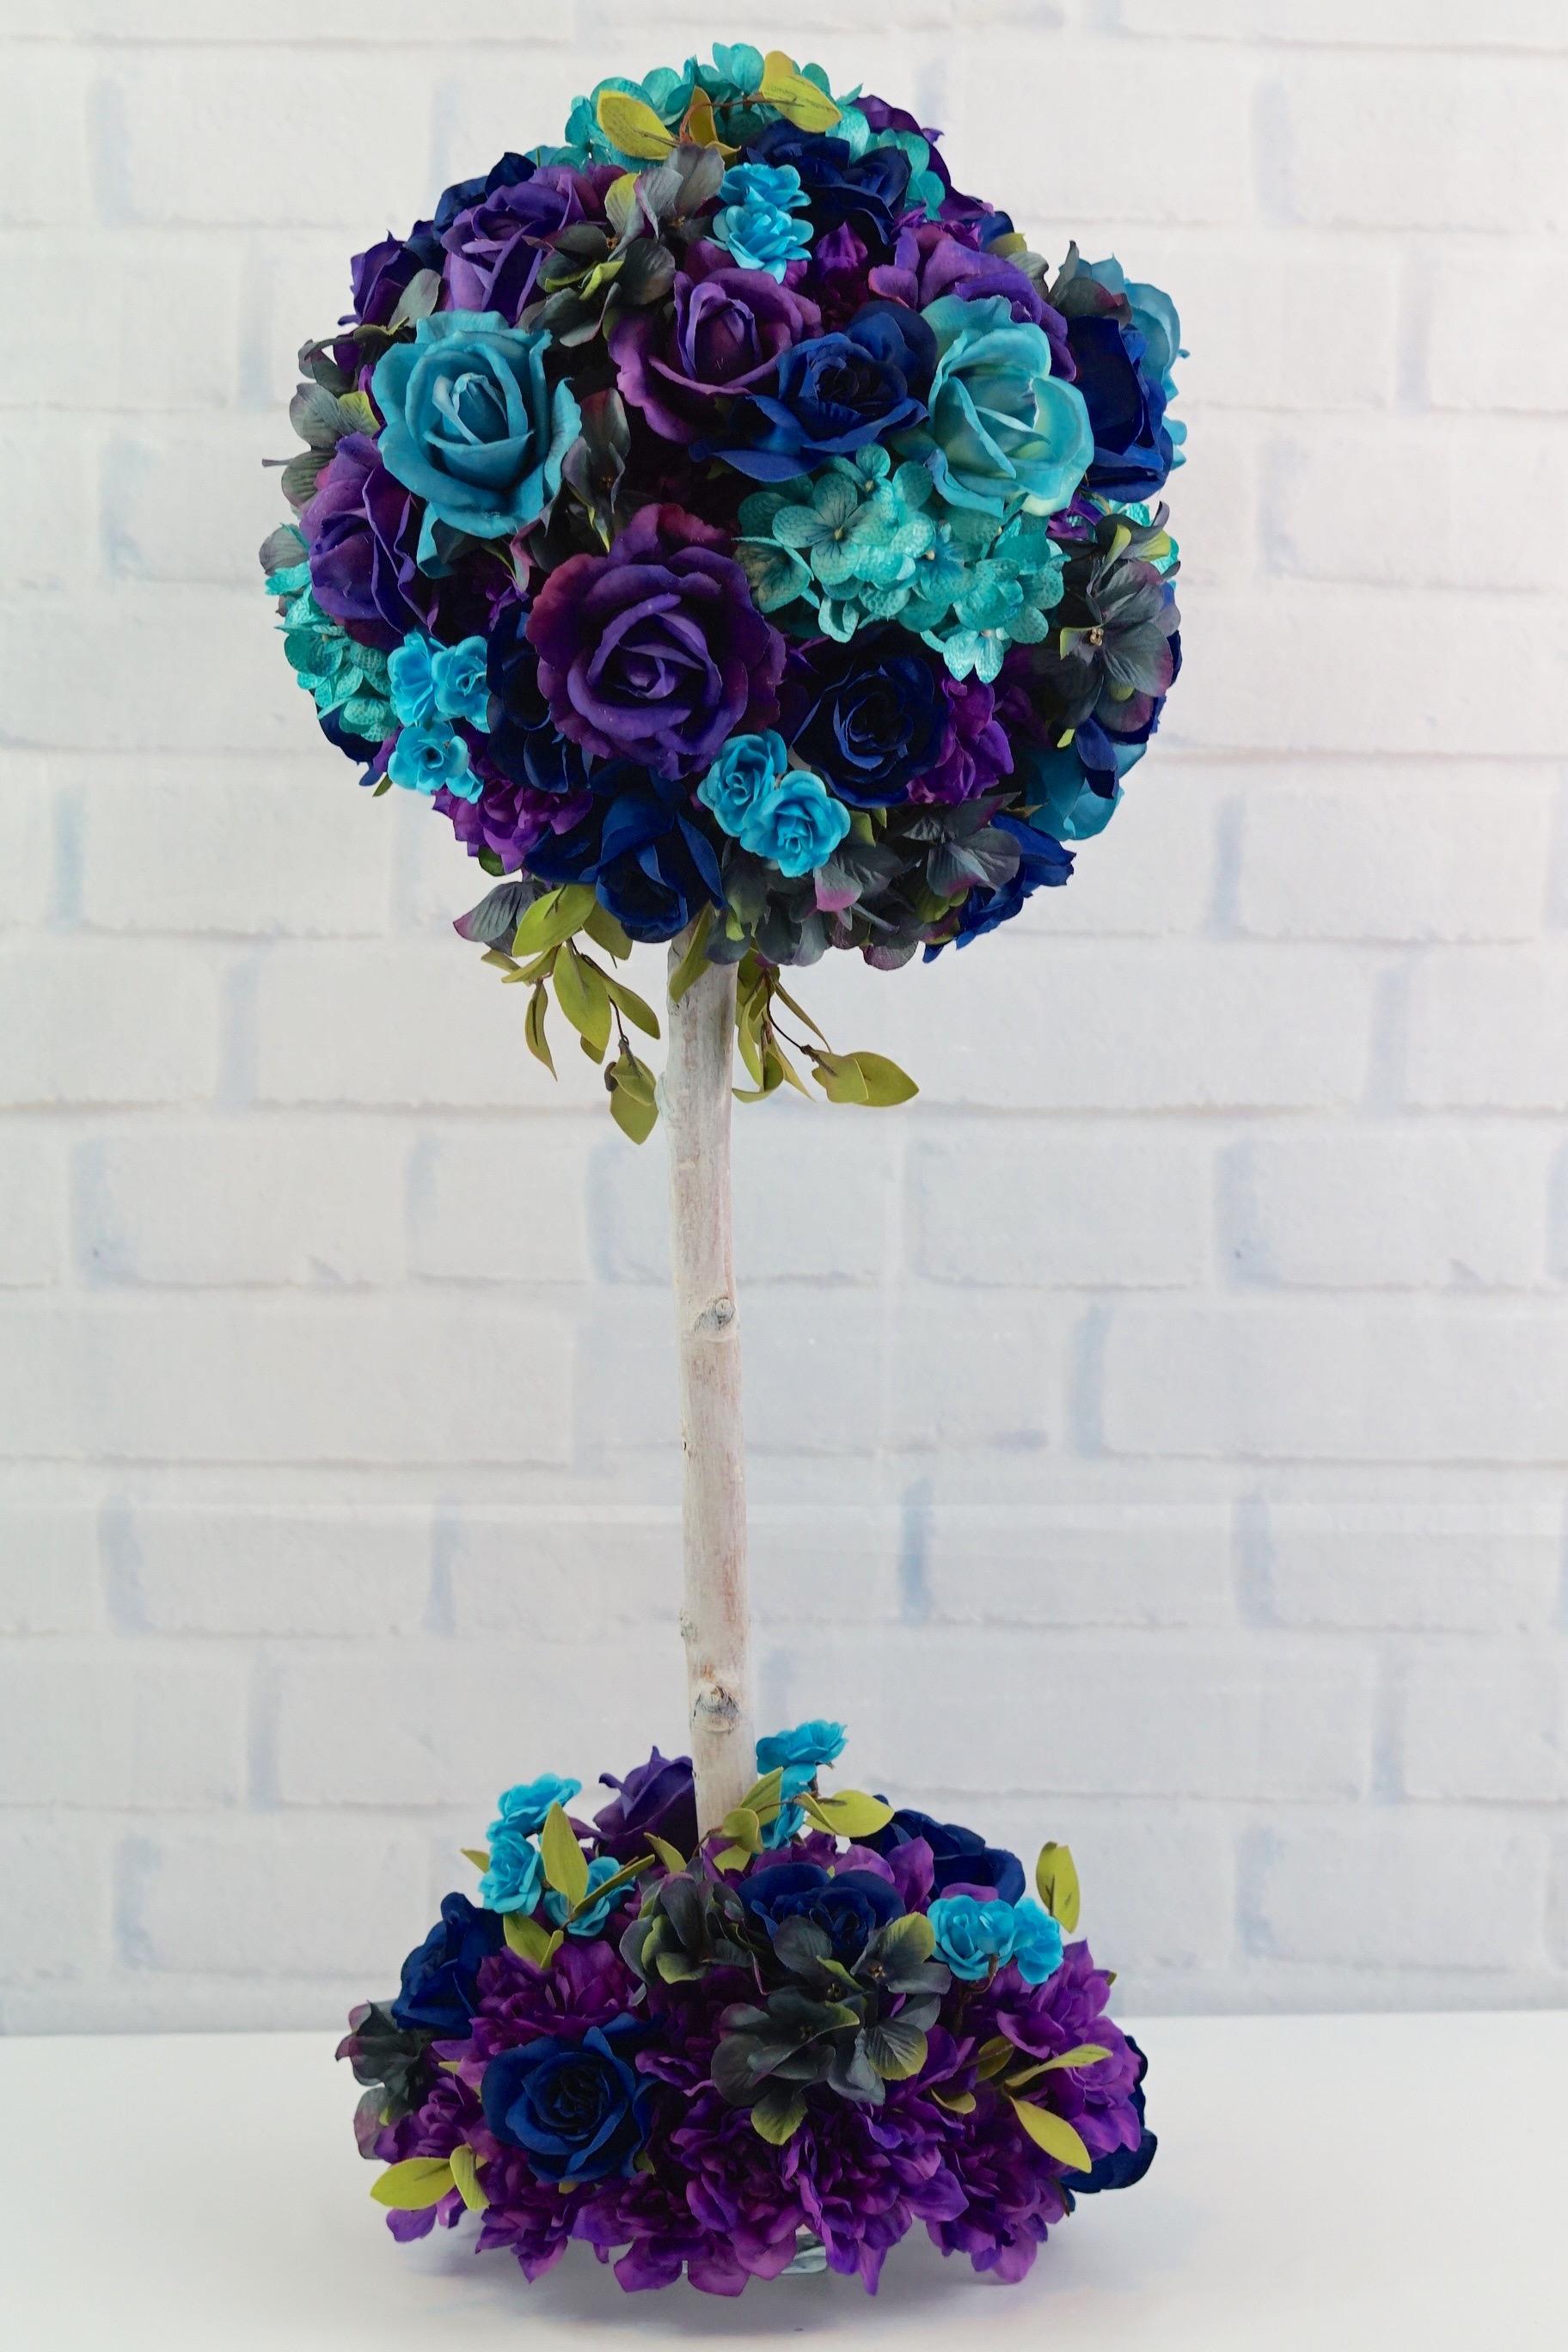 Diy Peacock Inspired Blue And Purple Wedding Centerpiece